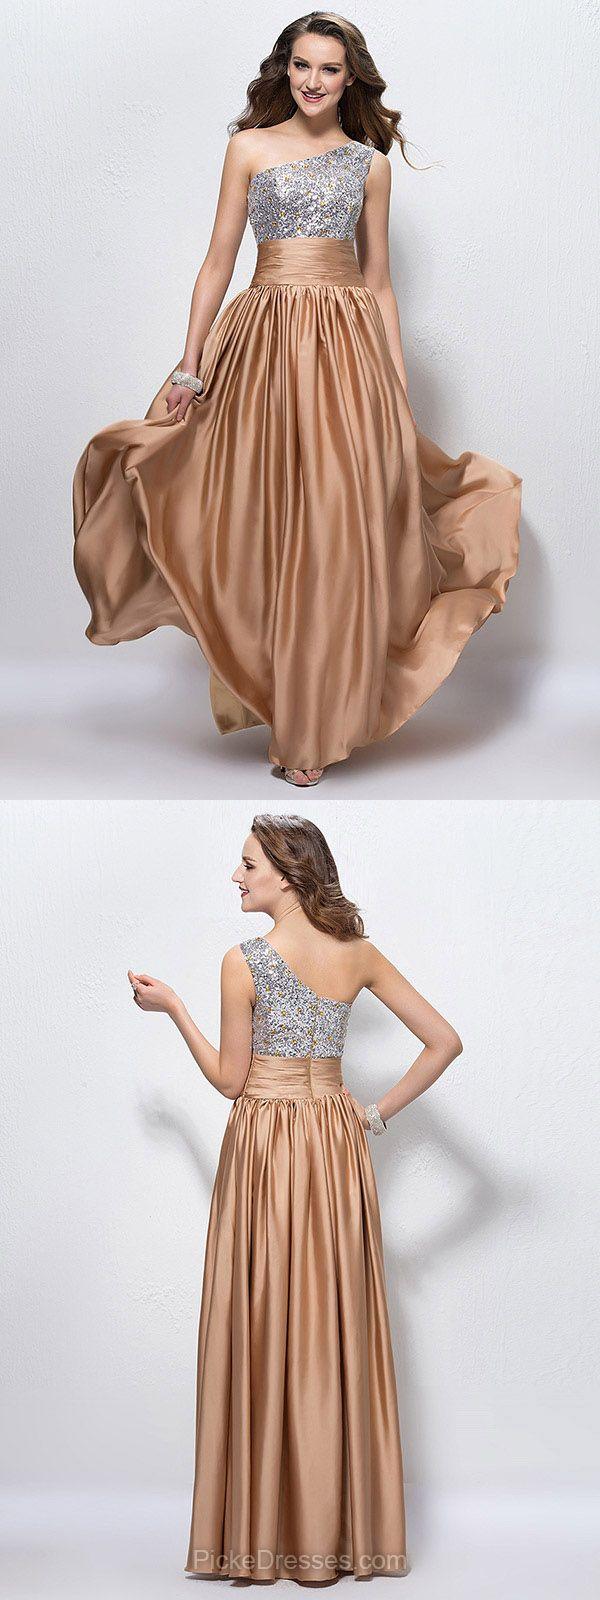 best chiffon prom dresses images on pinterest